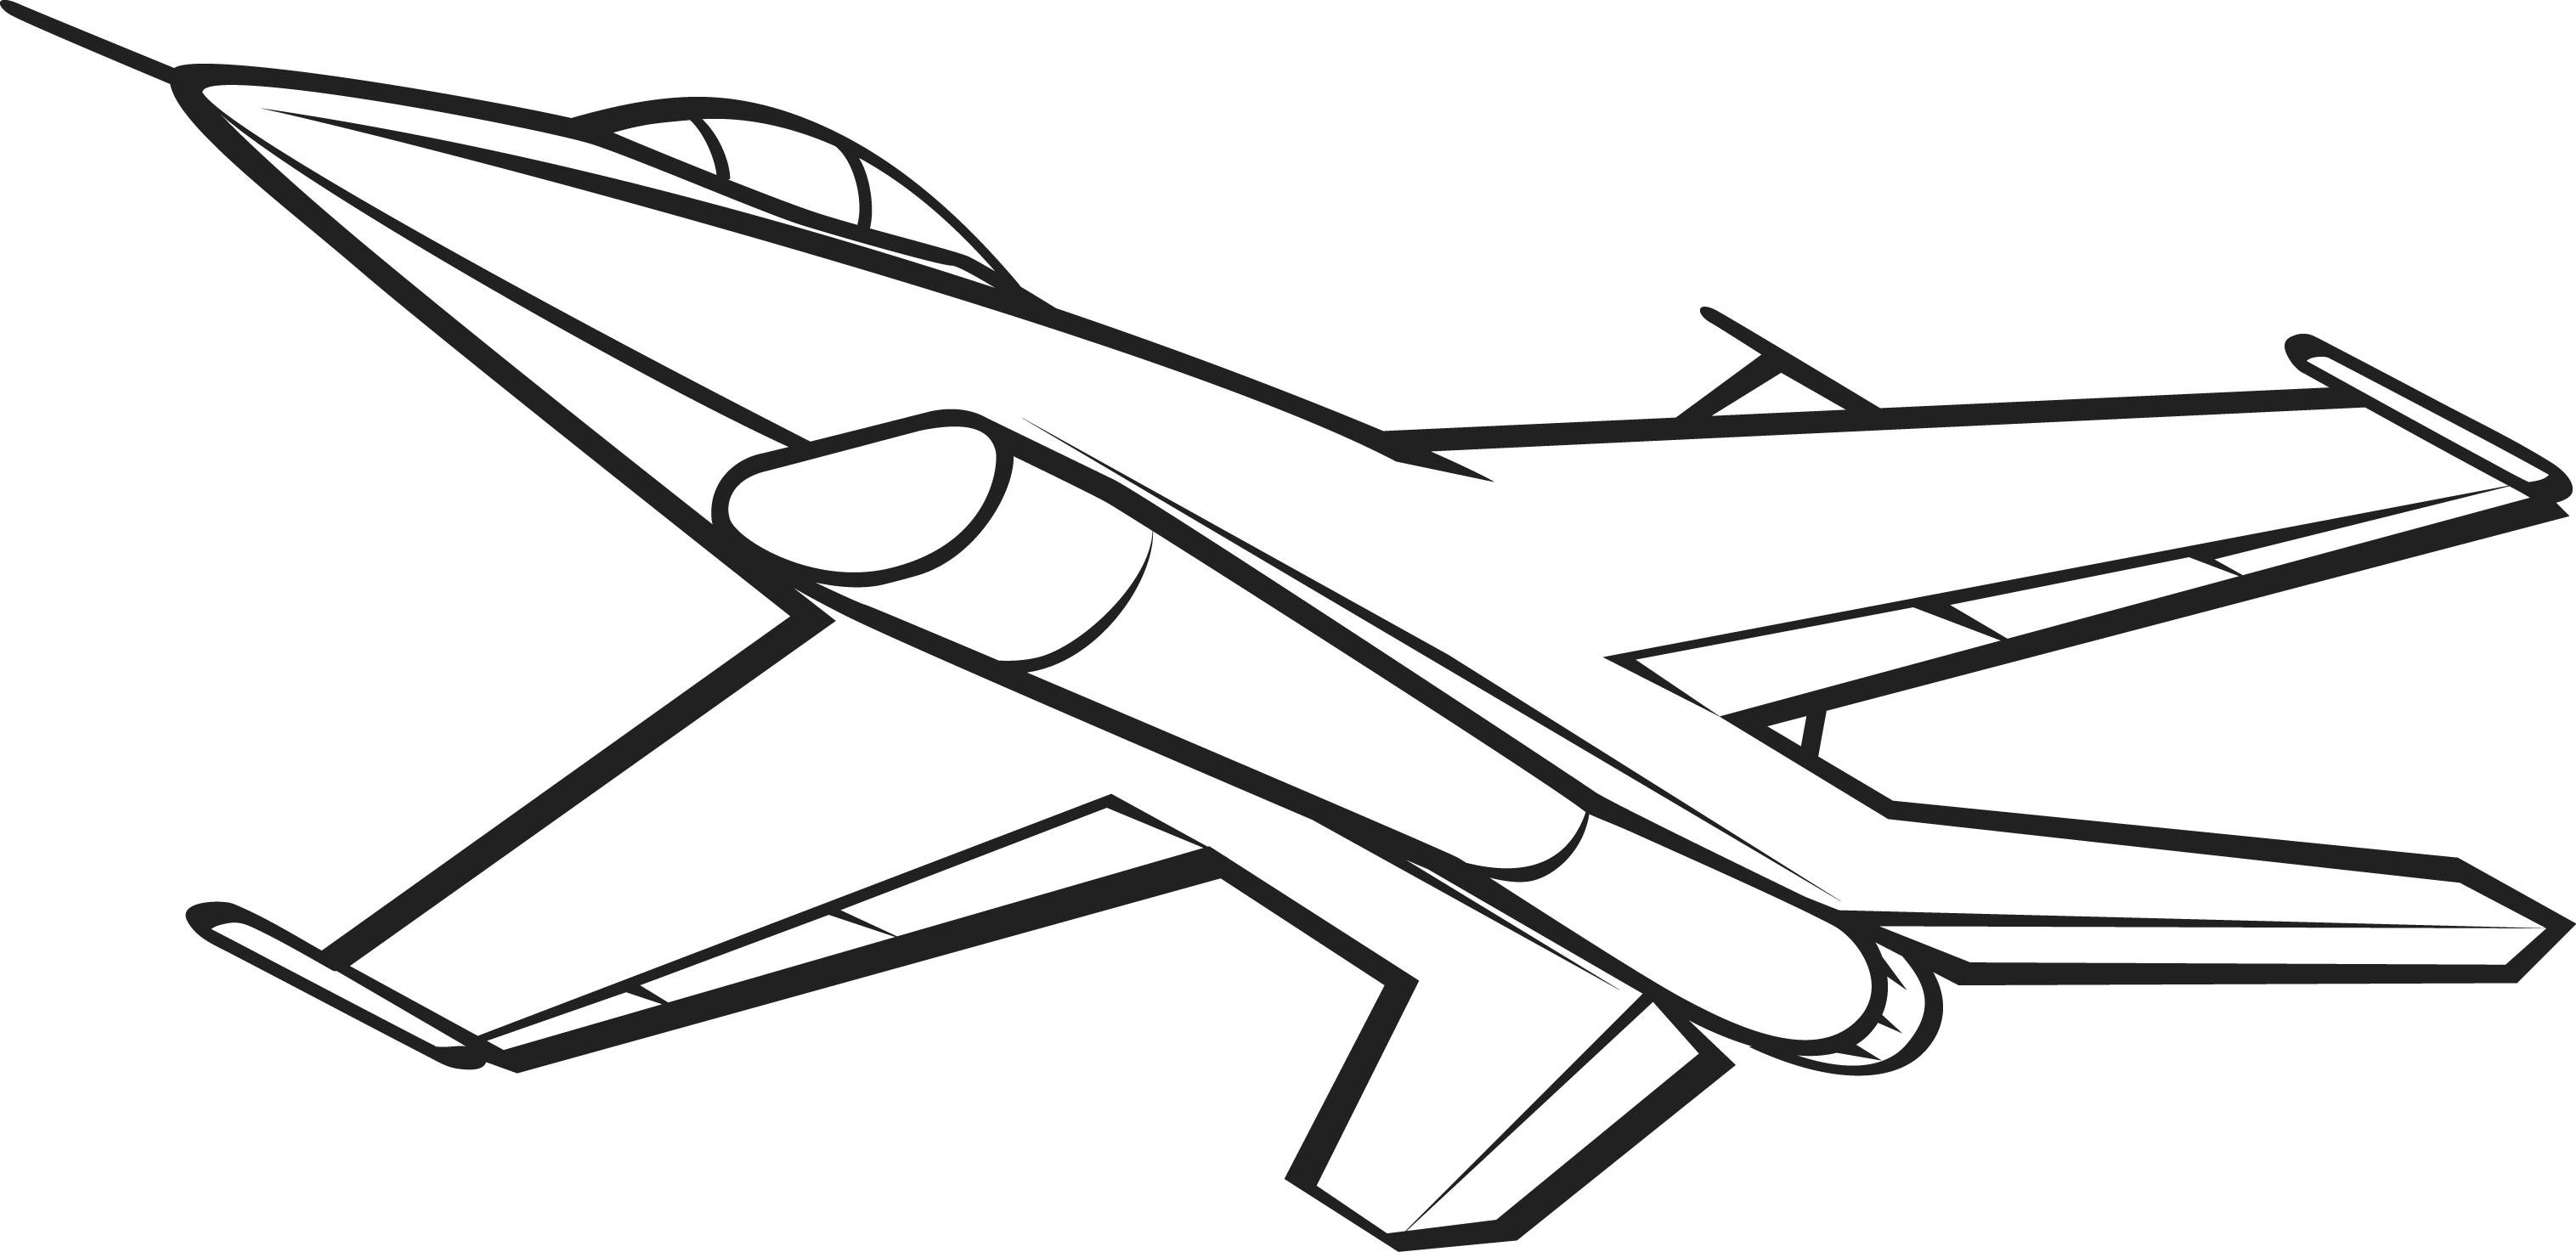 Line Art Jet : Jet black and white clipart suggest